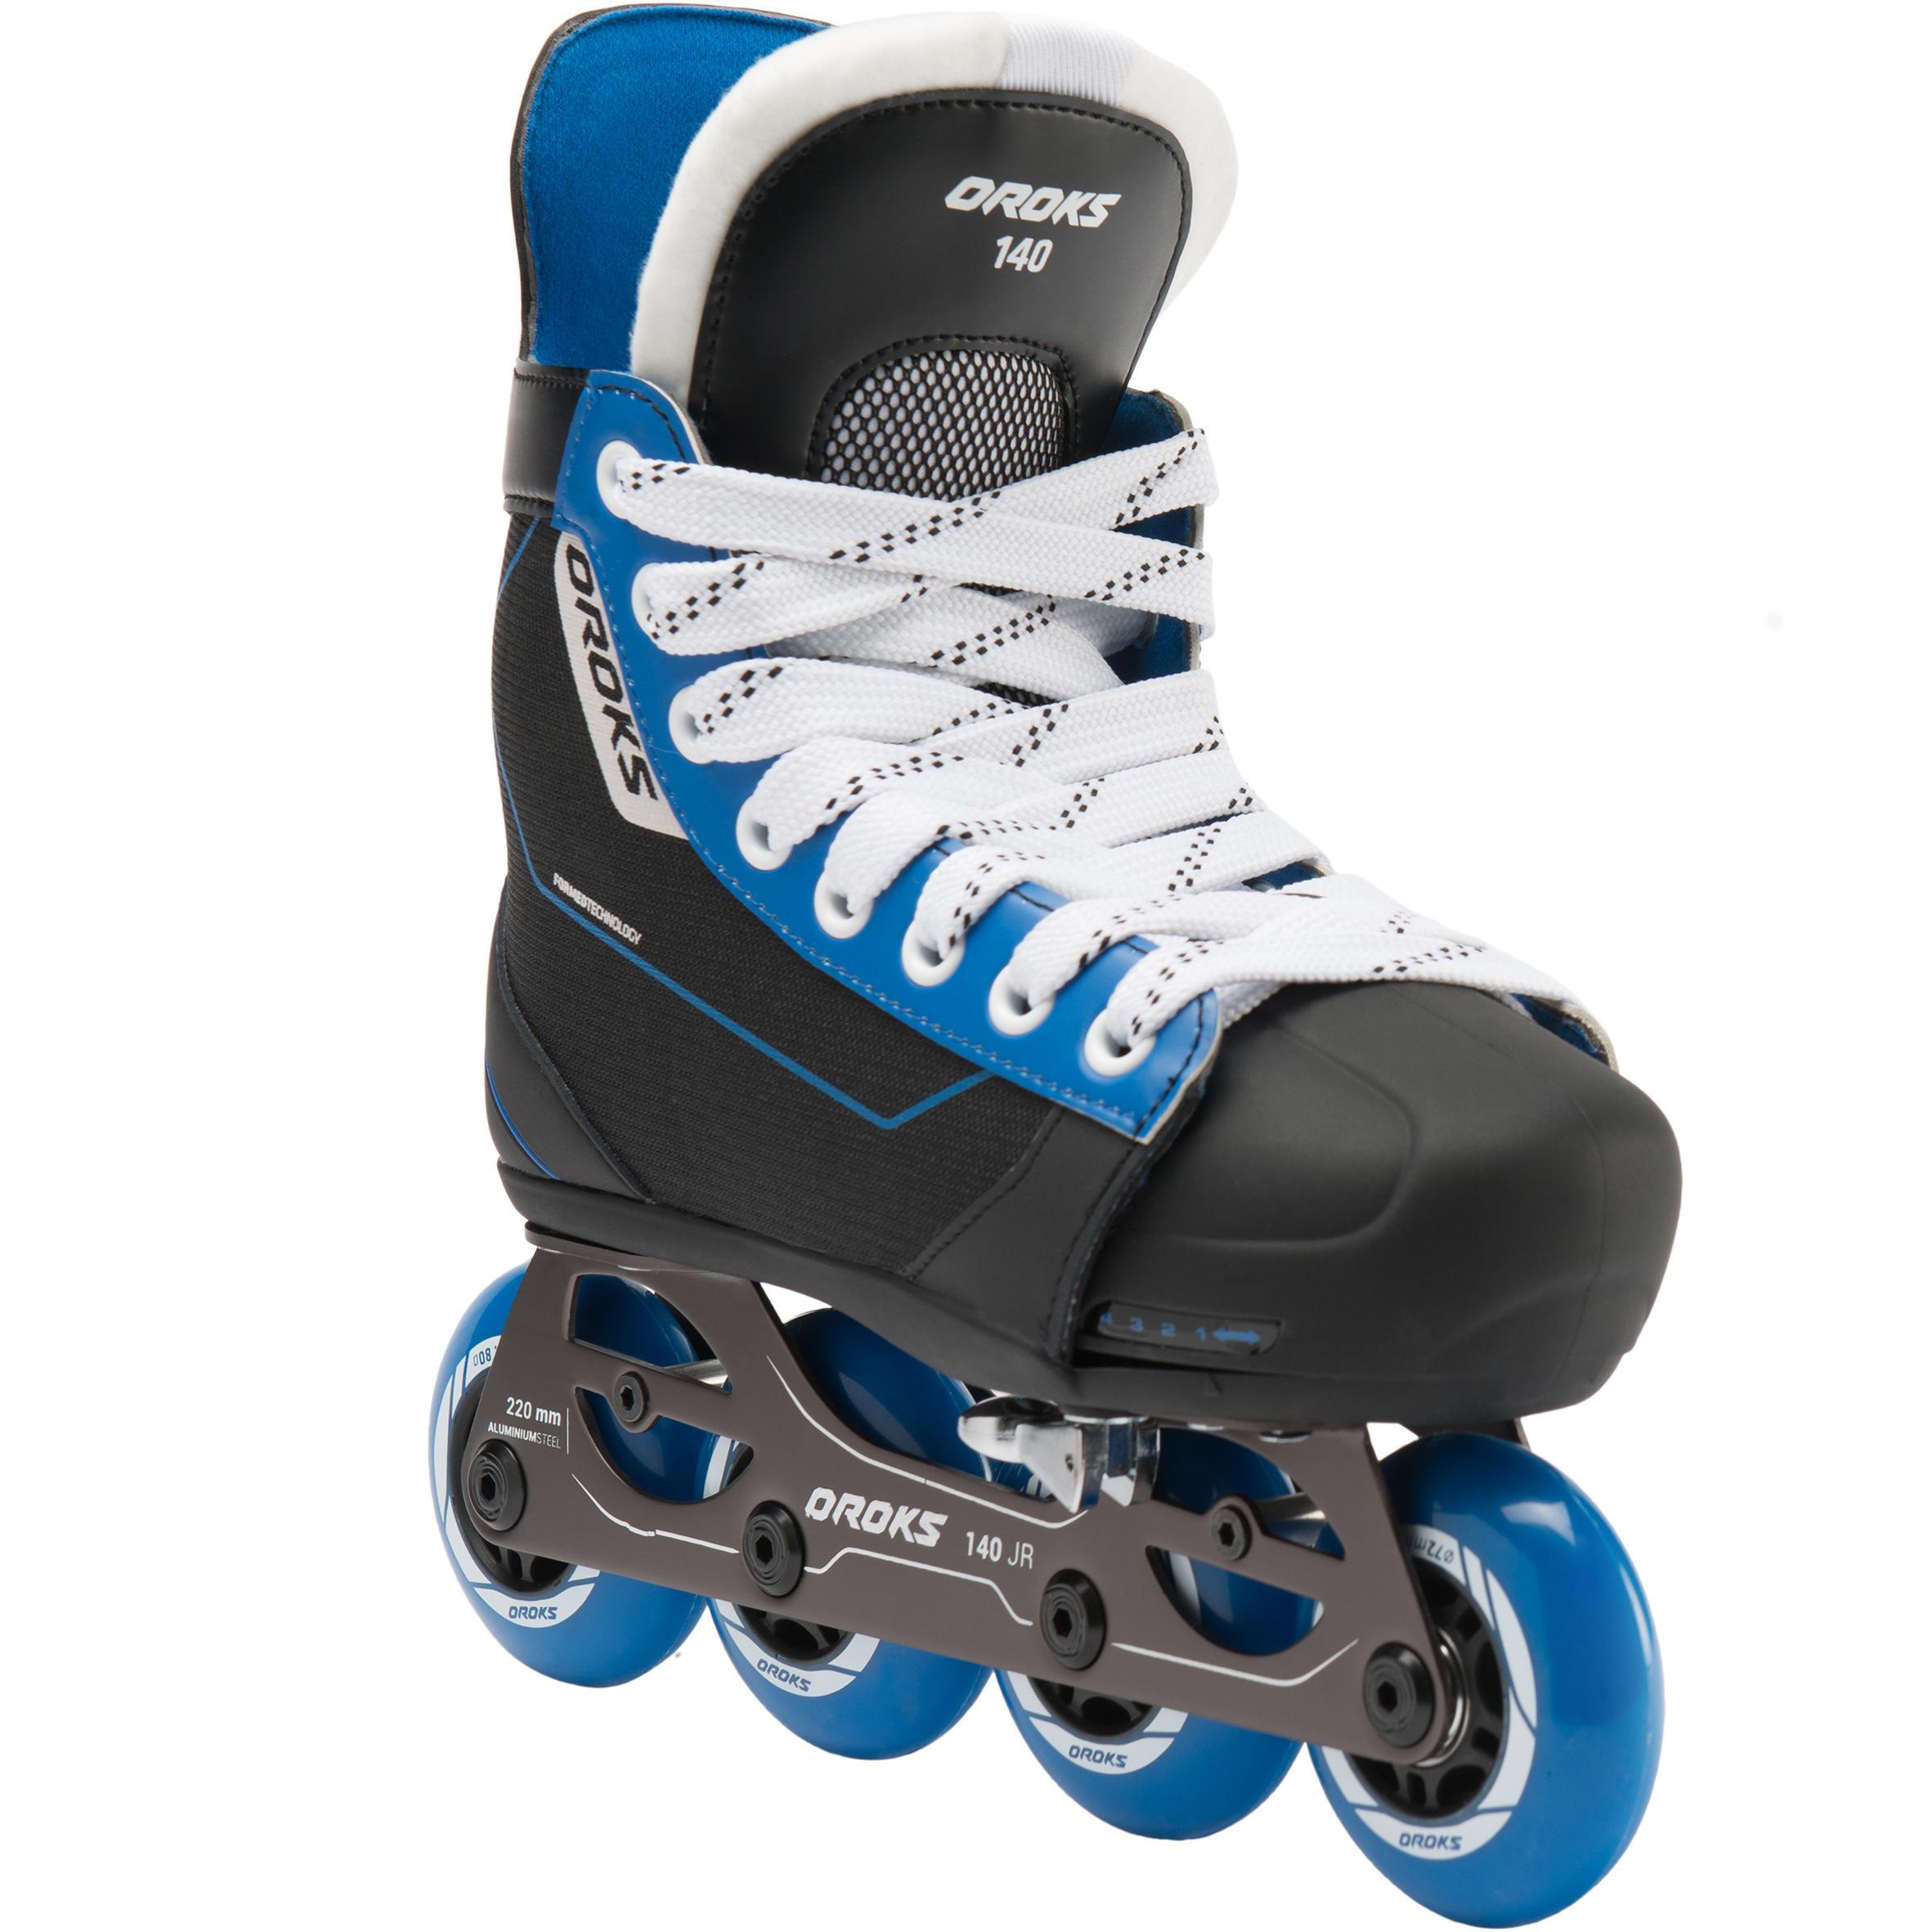 ILS140 JR Inline Skates